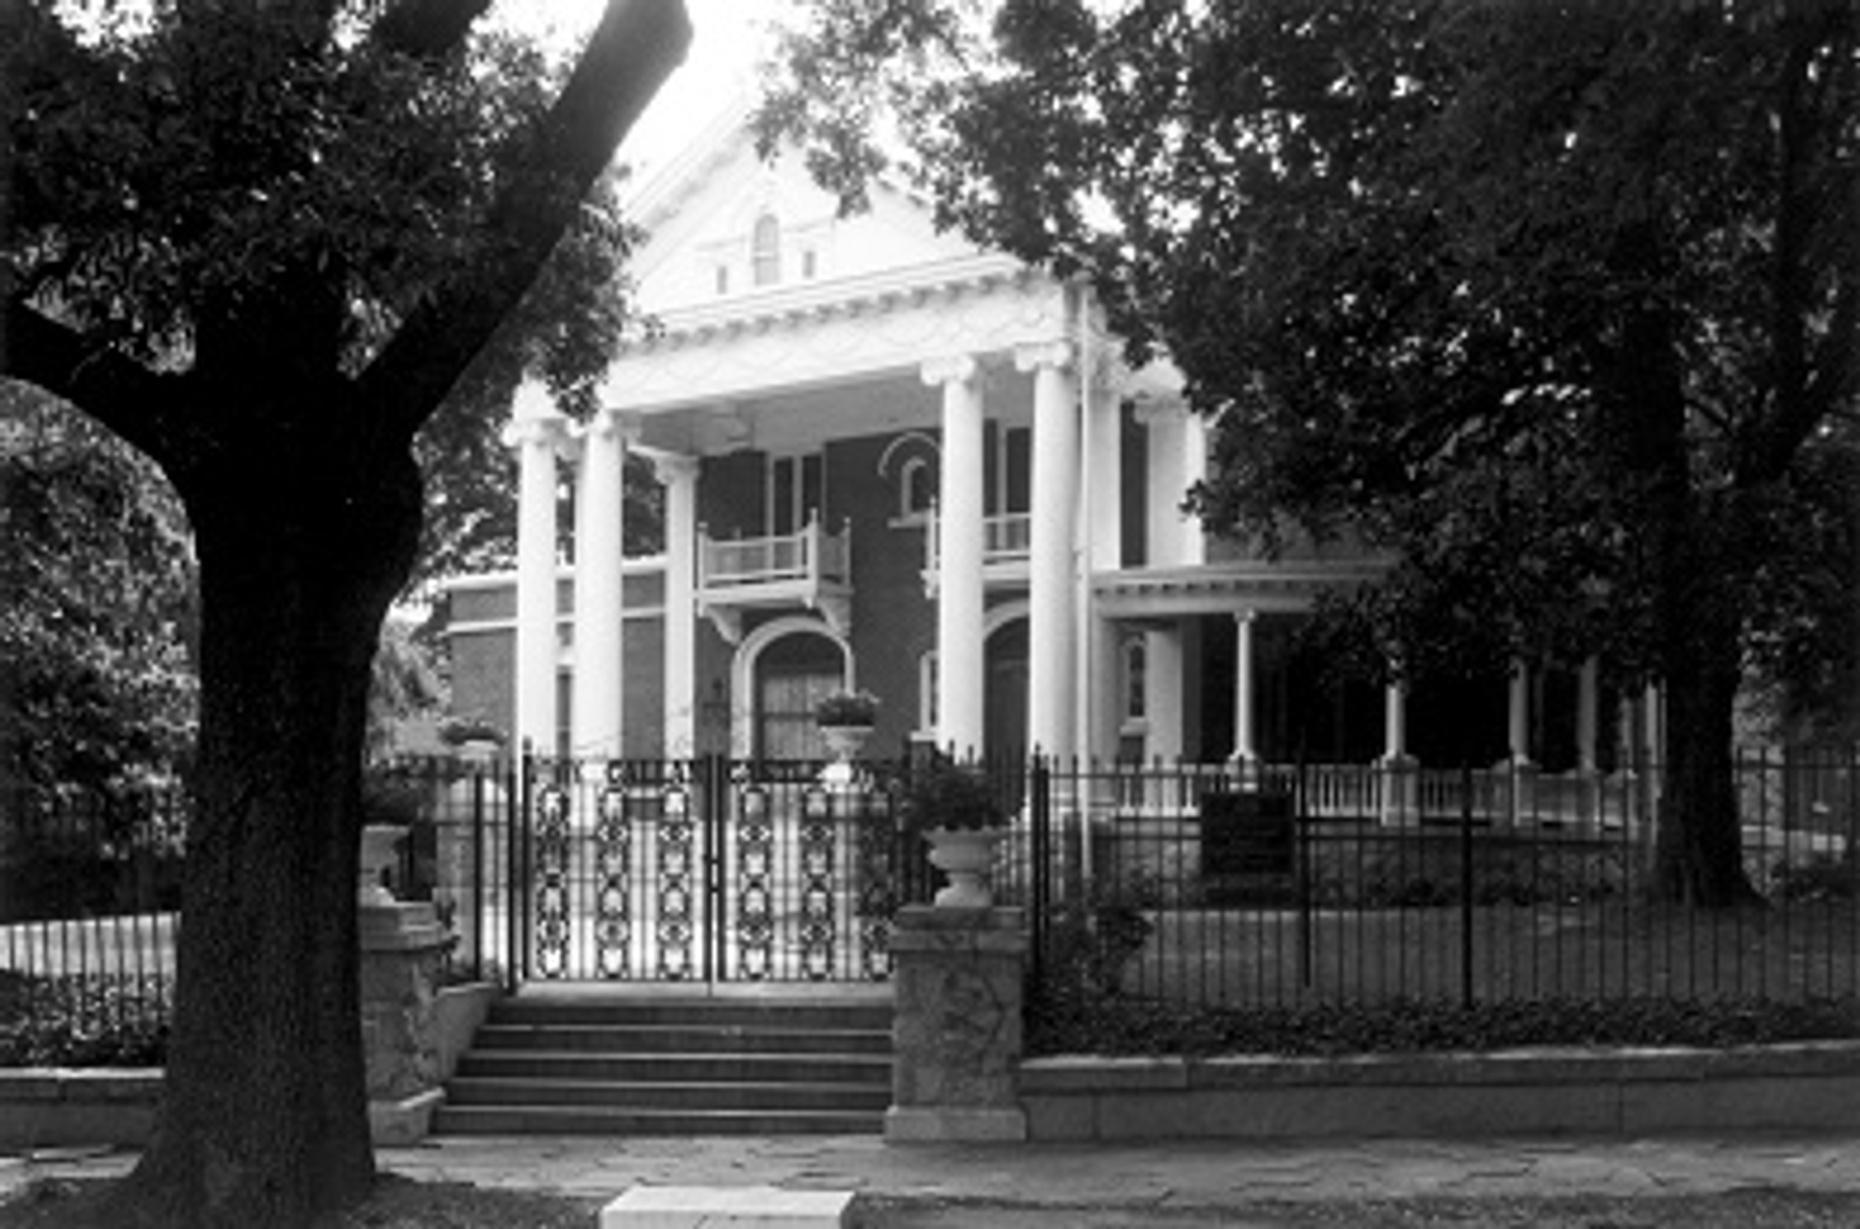 The Atlanta Preservation Center's Inman Park Tour